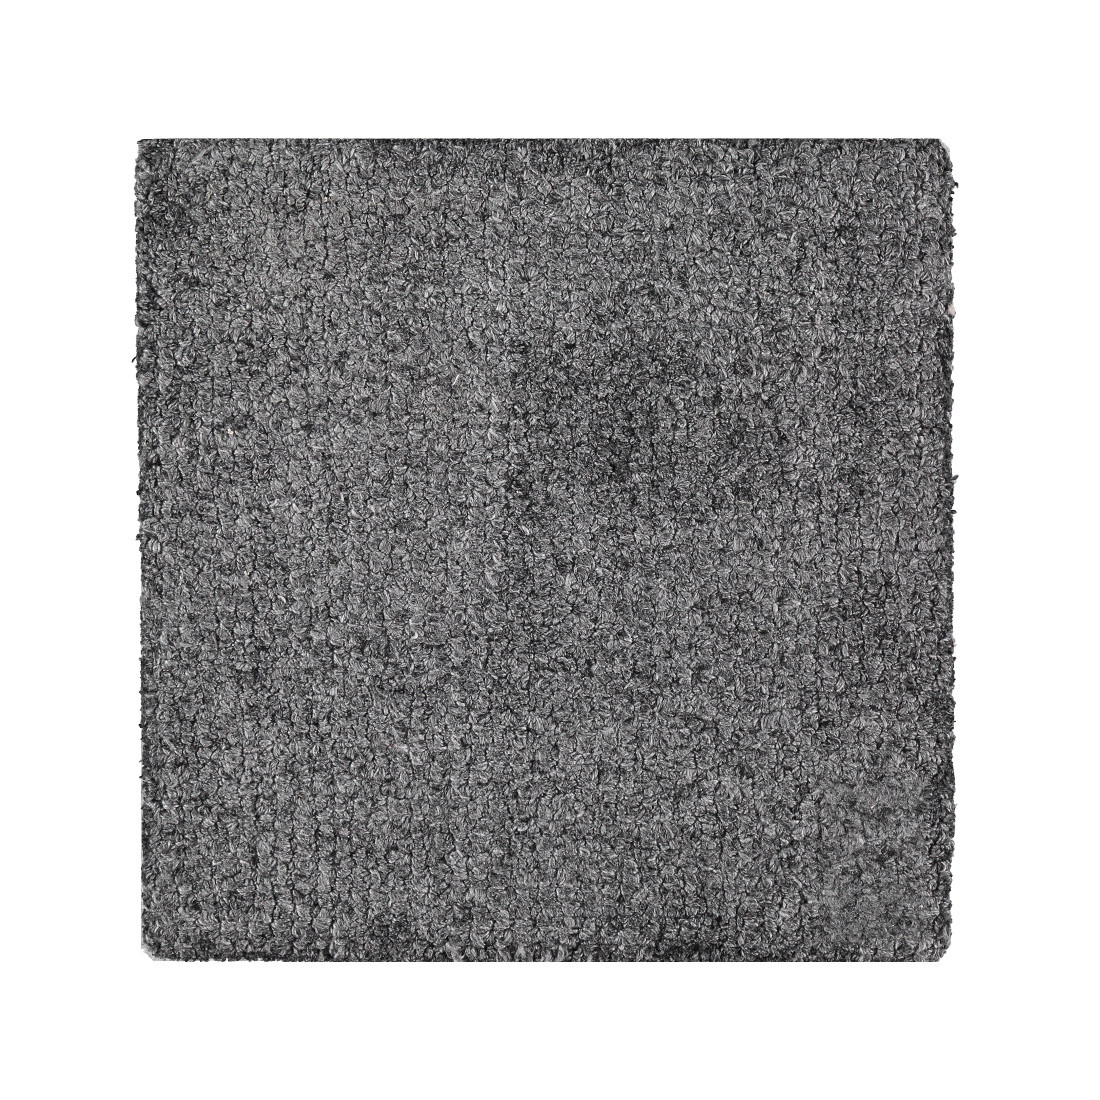 Hartford Handmade Wool Carpet - Carbon